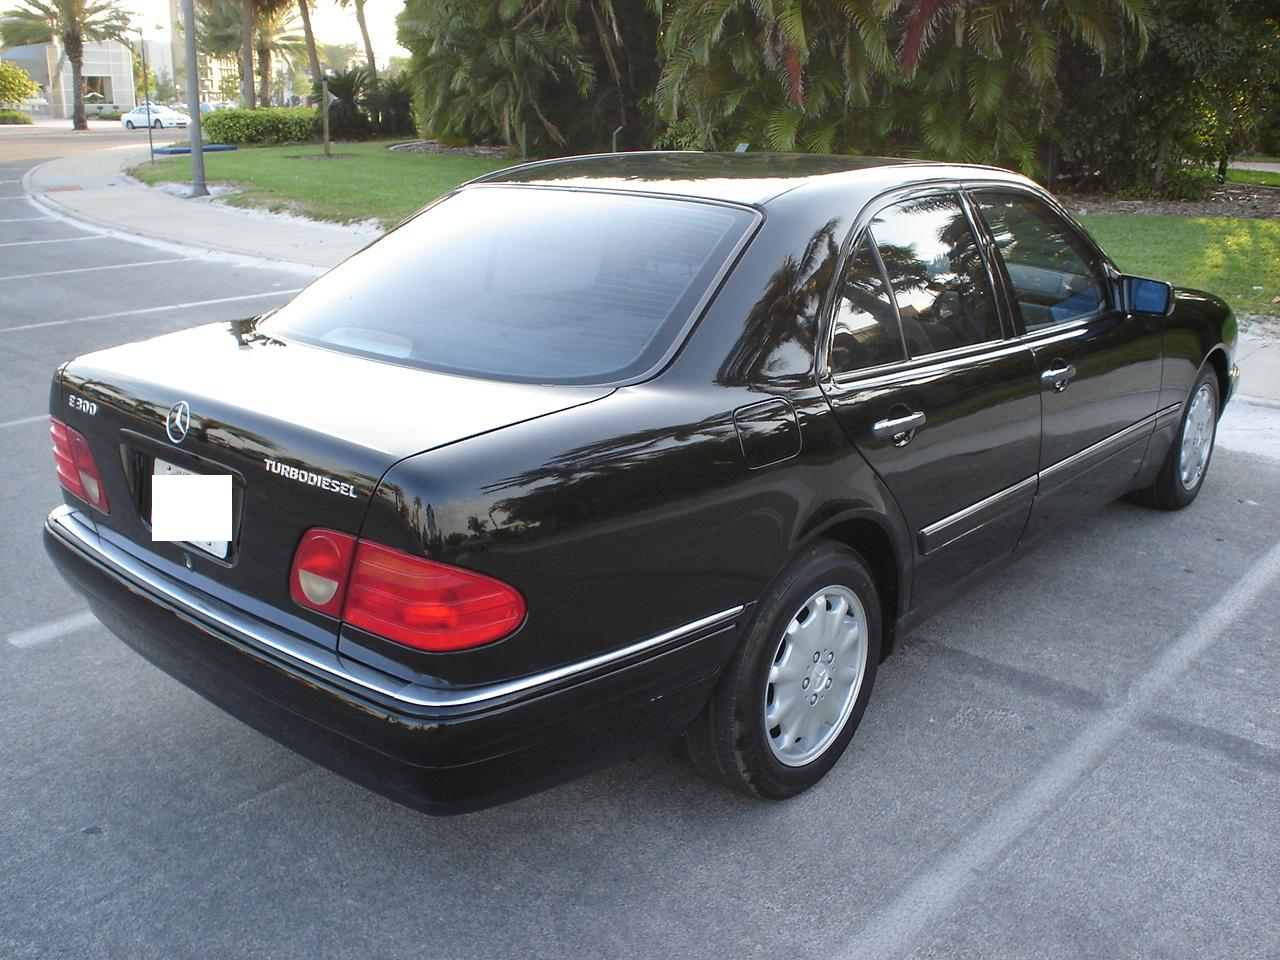 1999 Mercedes-Benz E-Class - Pictures - CarGurus